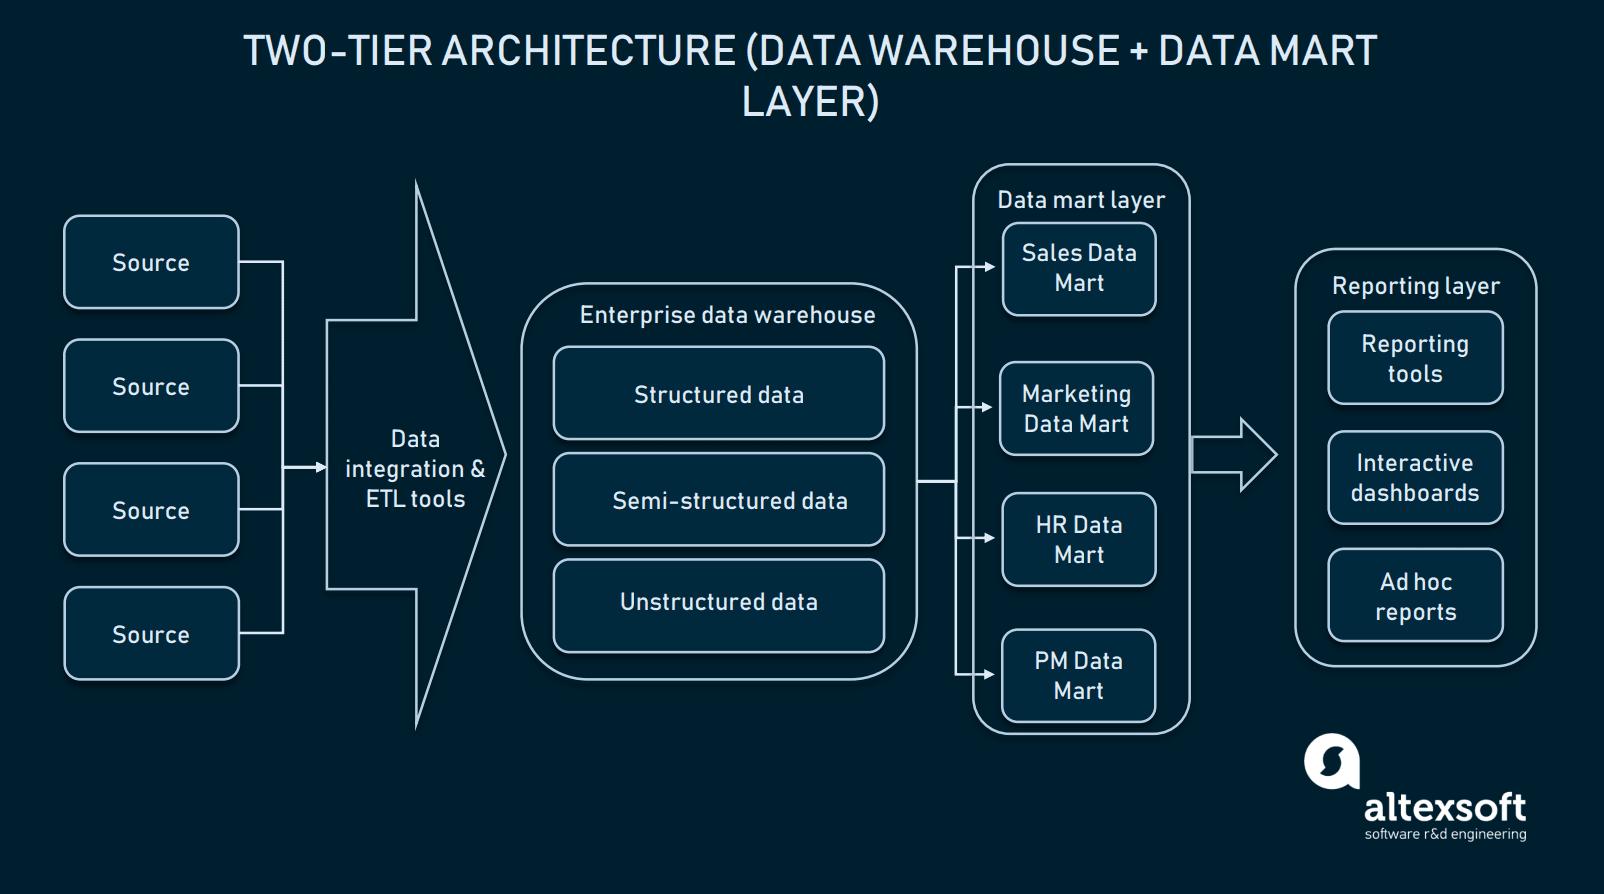 Two-tier data warehouse architecture